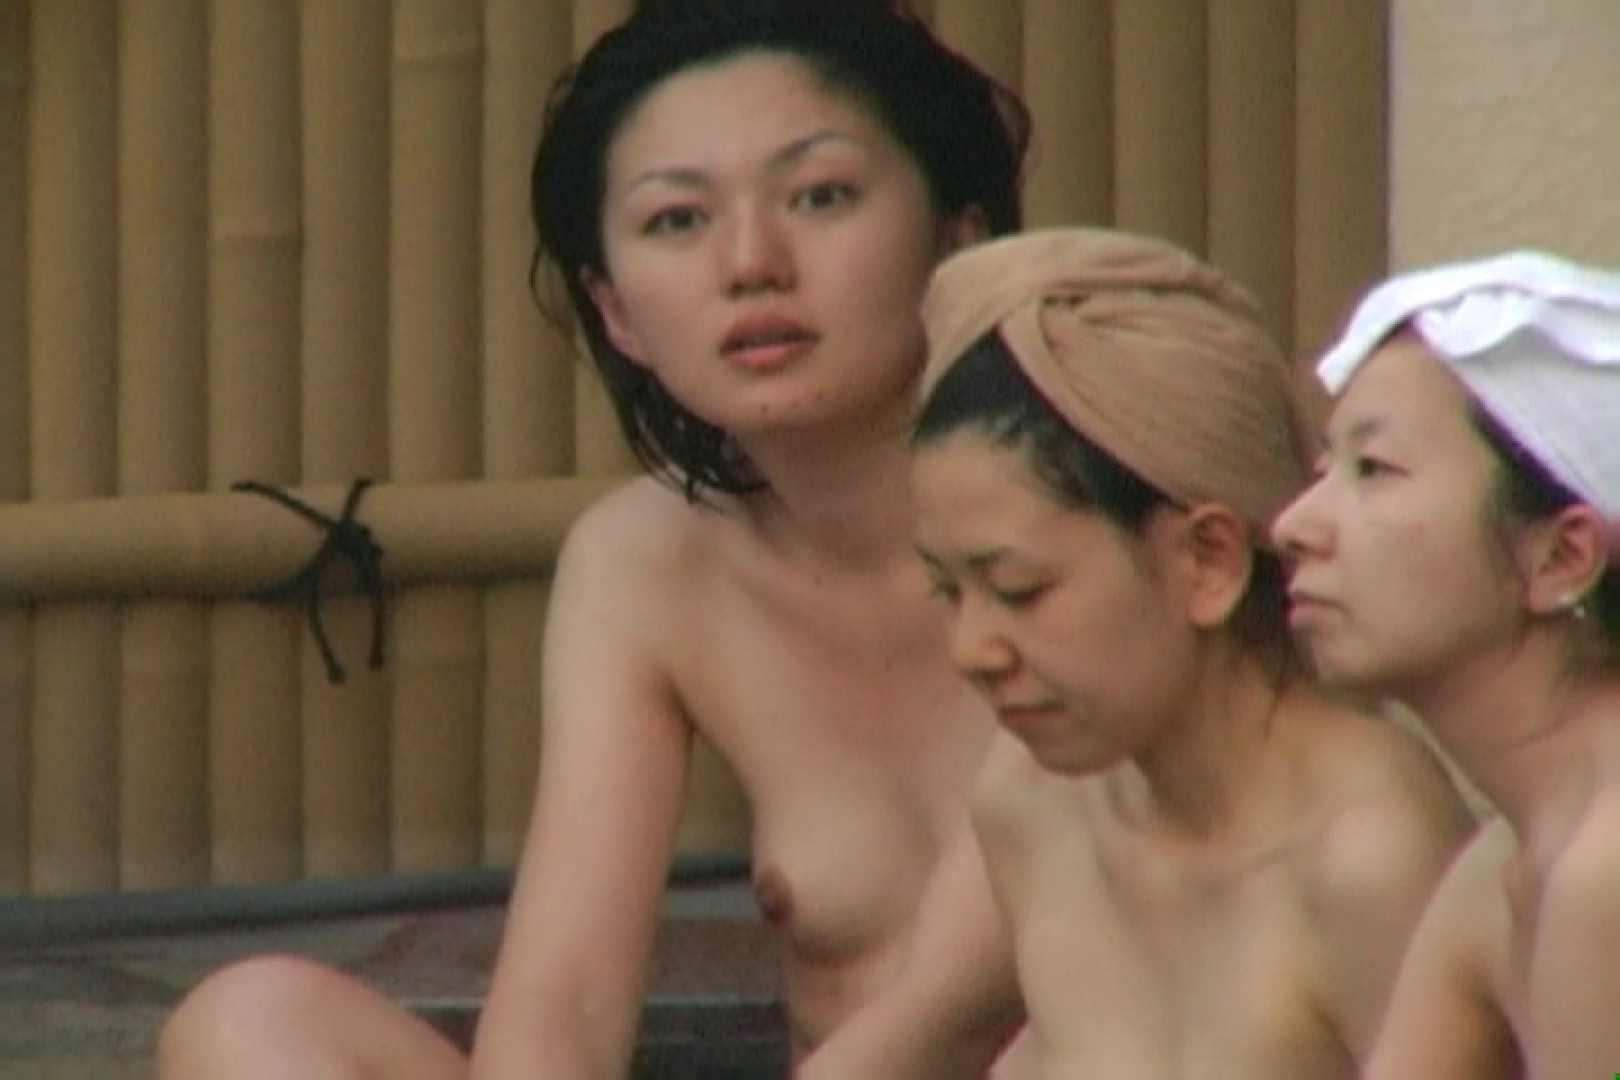 Aquaな露天風呂Vol.613 OL女体  43連発 39